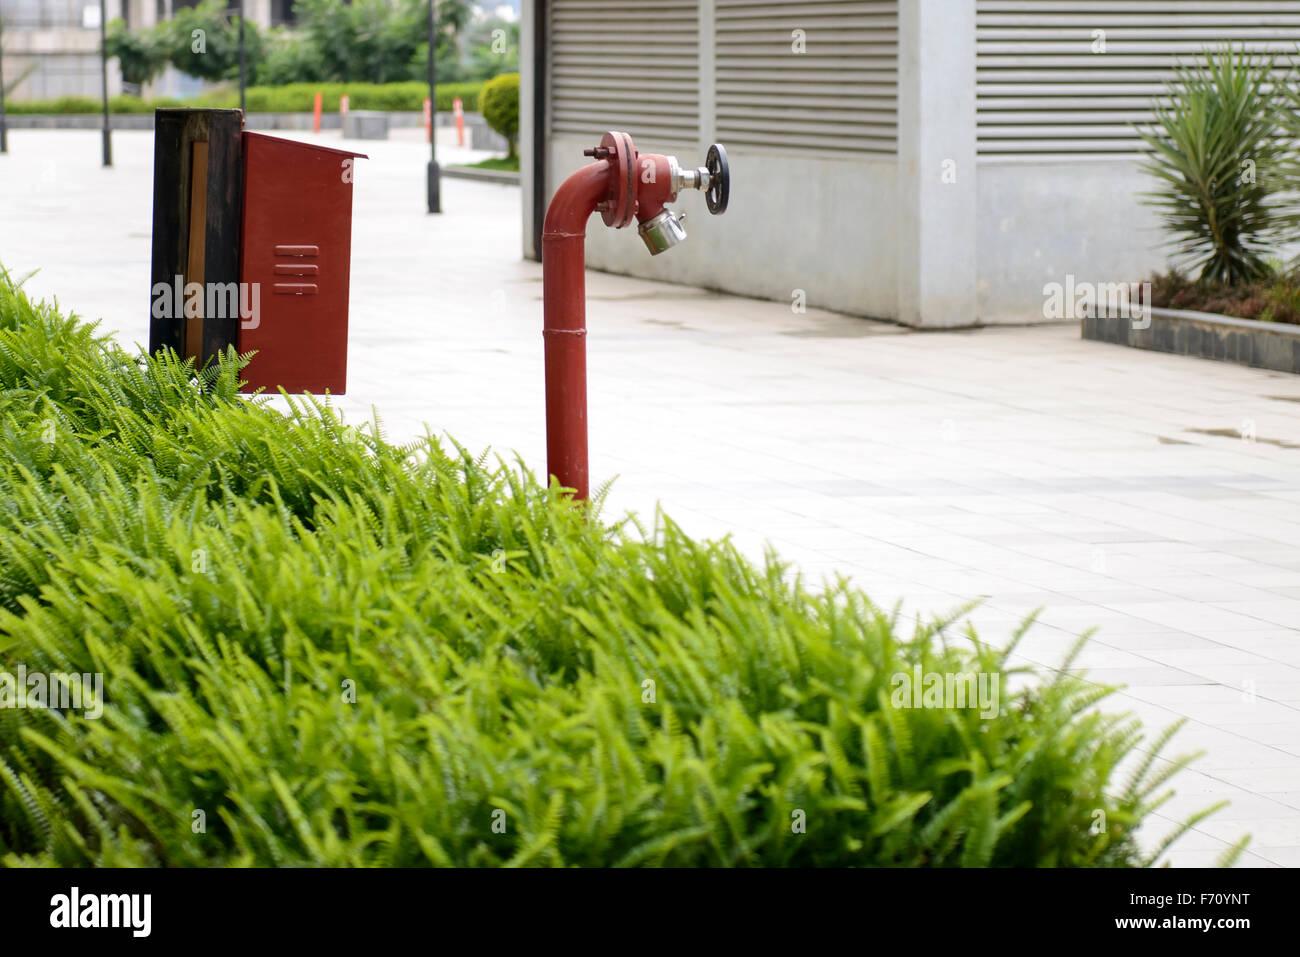 Fire safety hydrant valve, visakhapatnam, andhra pradesh, india, asia - Stock Image